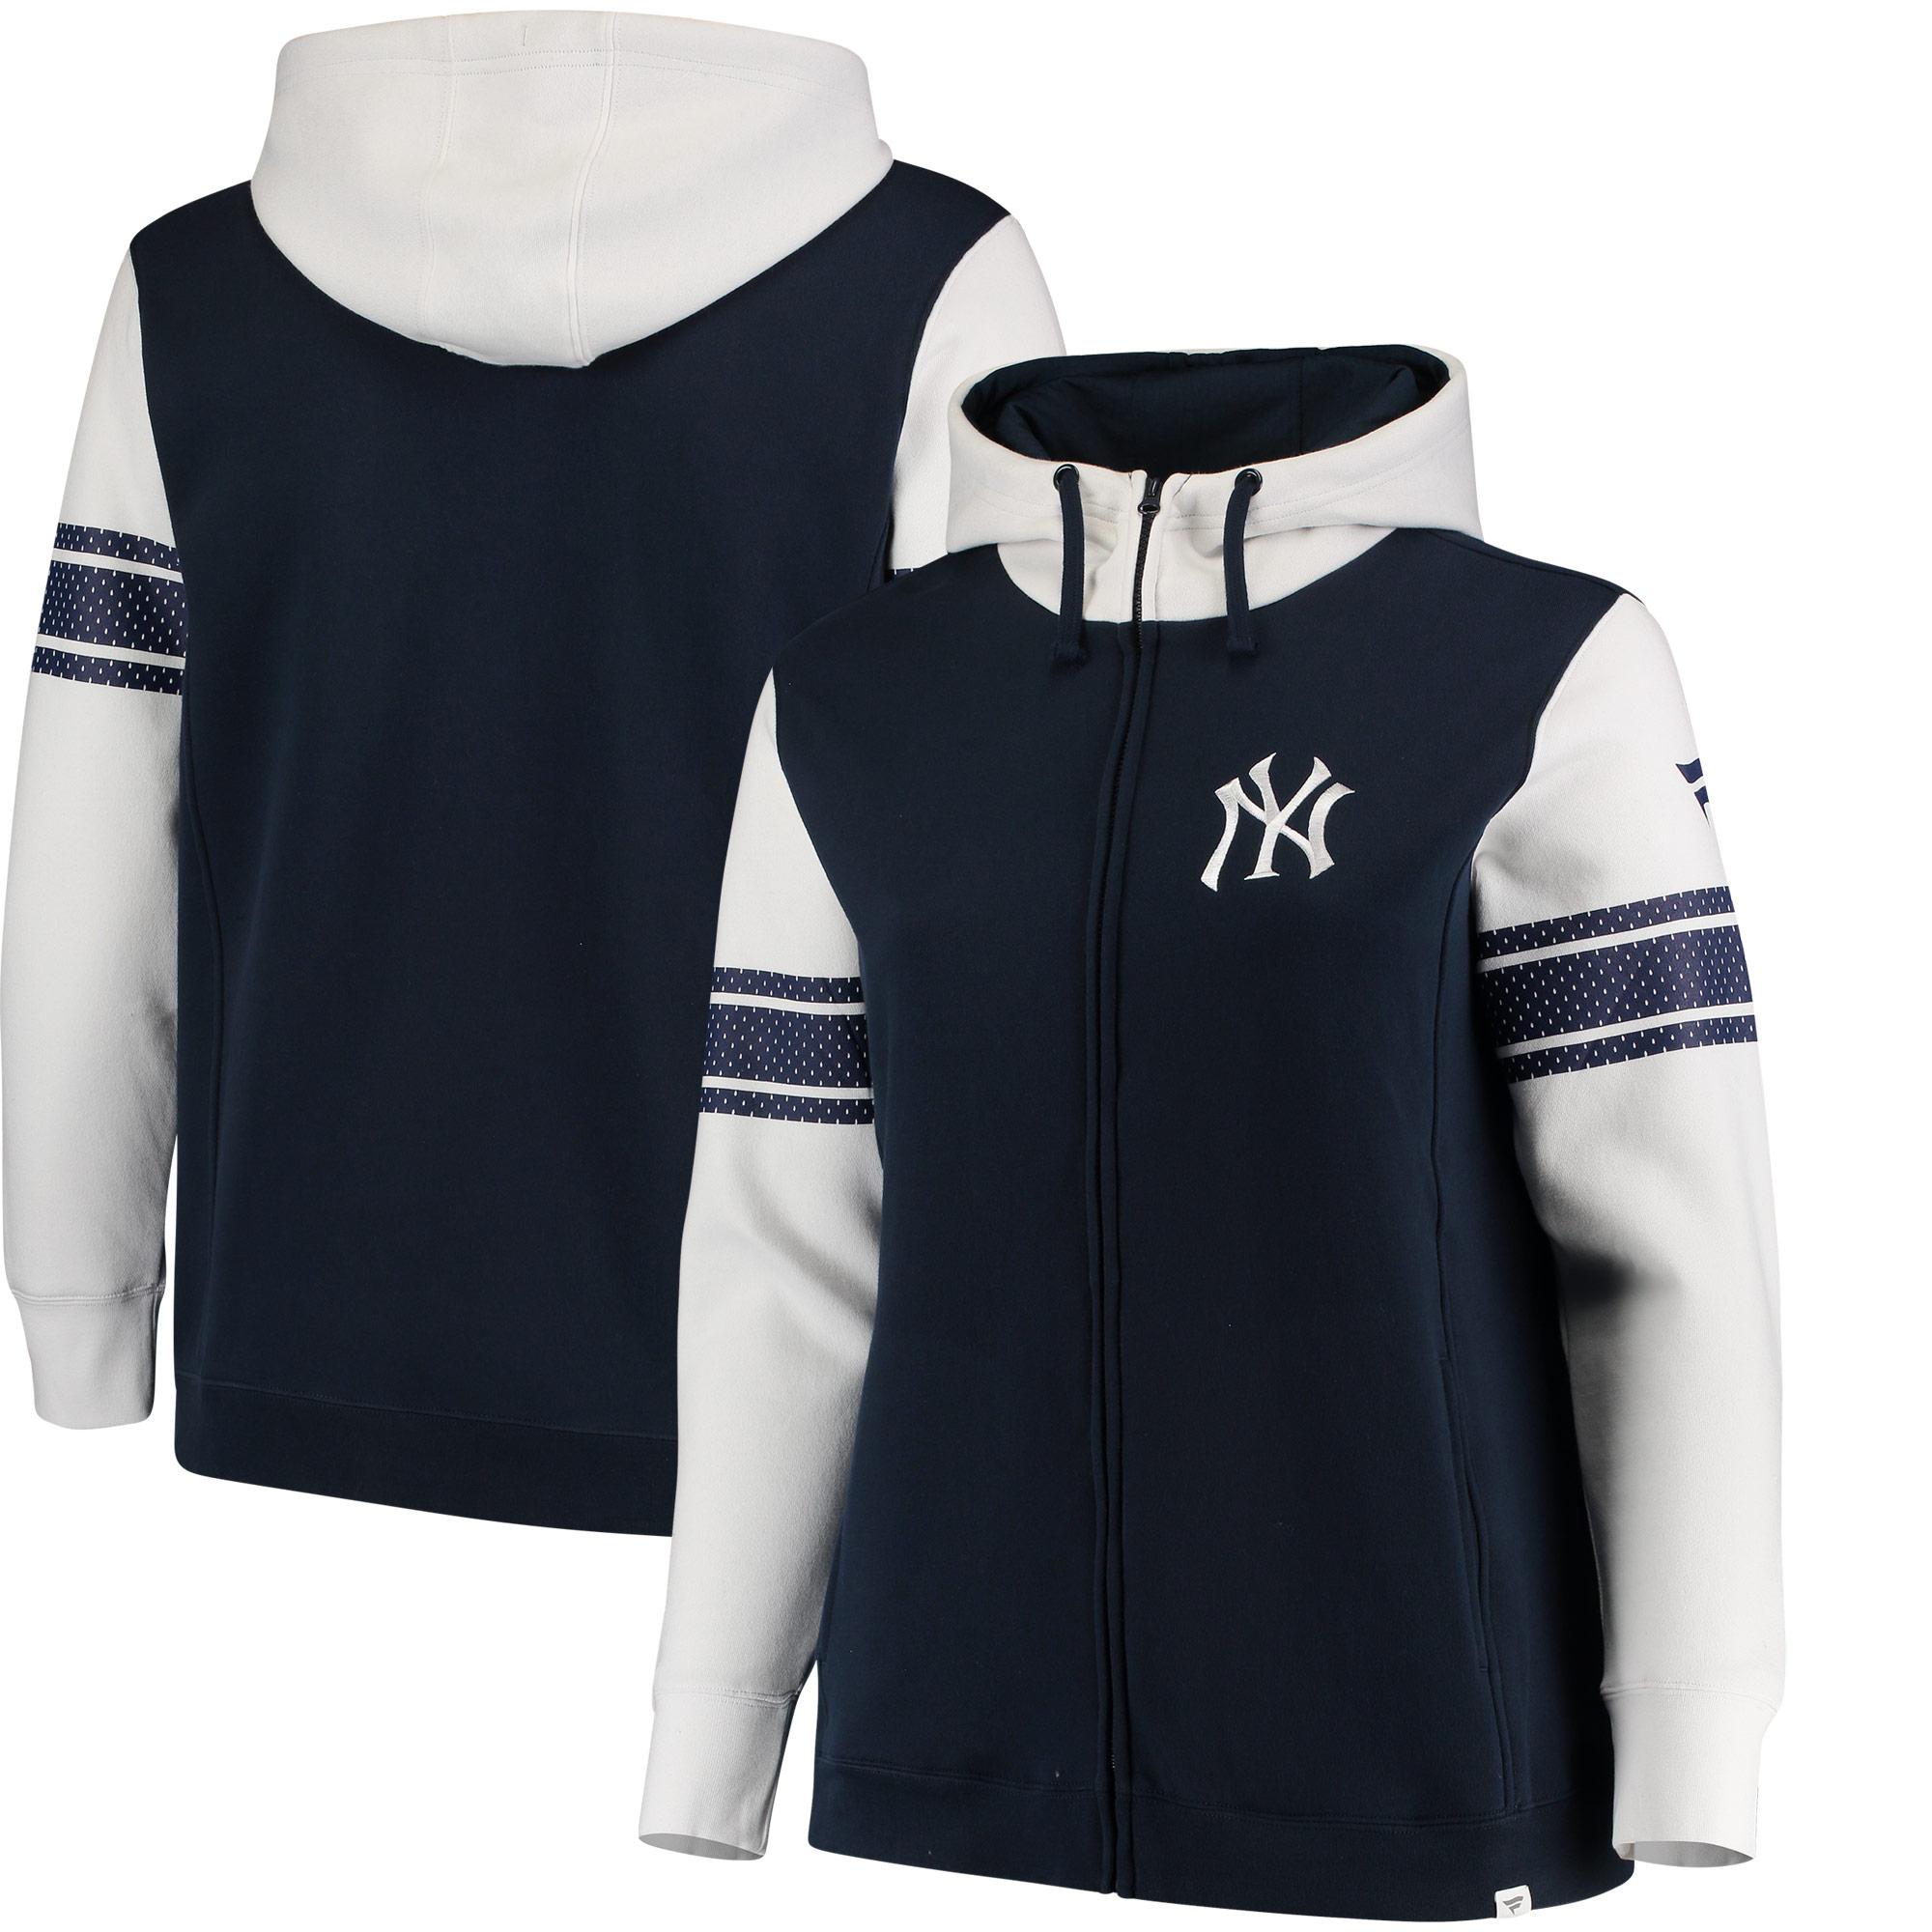 New York Yankees Fanatics Branded Women's Plus Size Iconic Fleece Full-Zip Hoodie - Navy